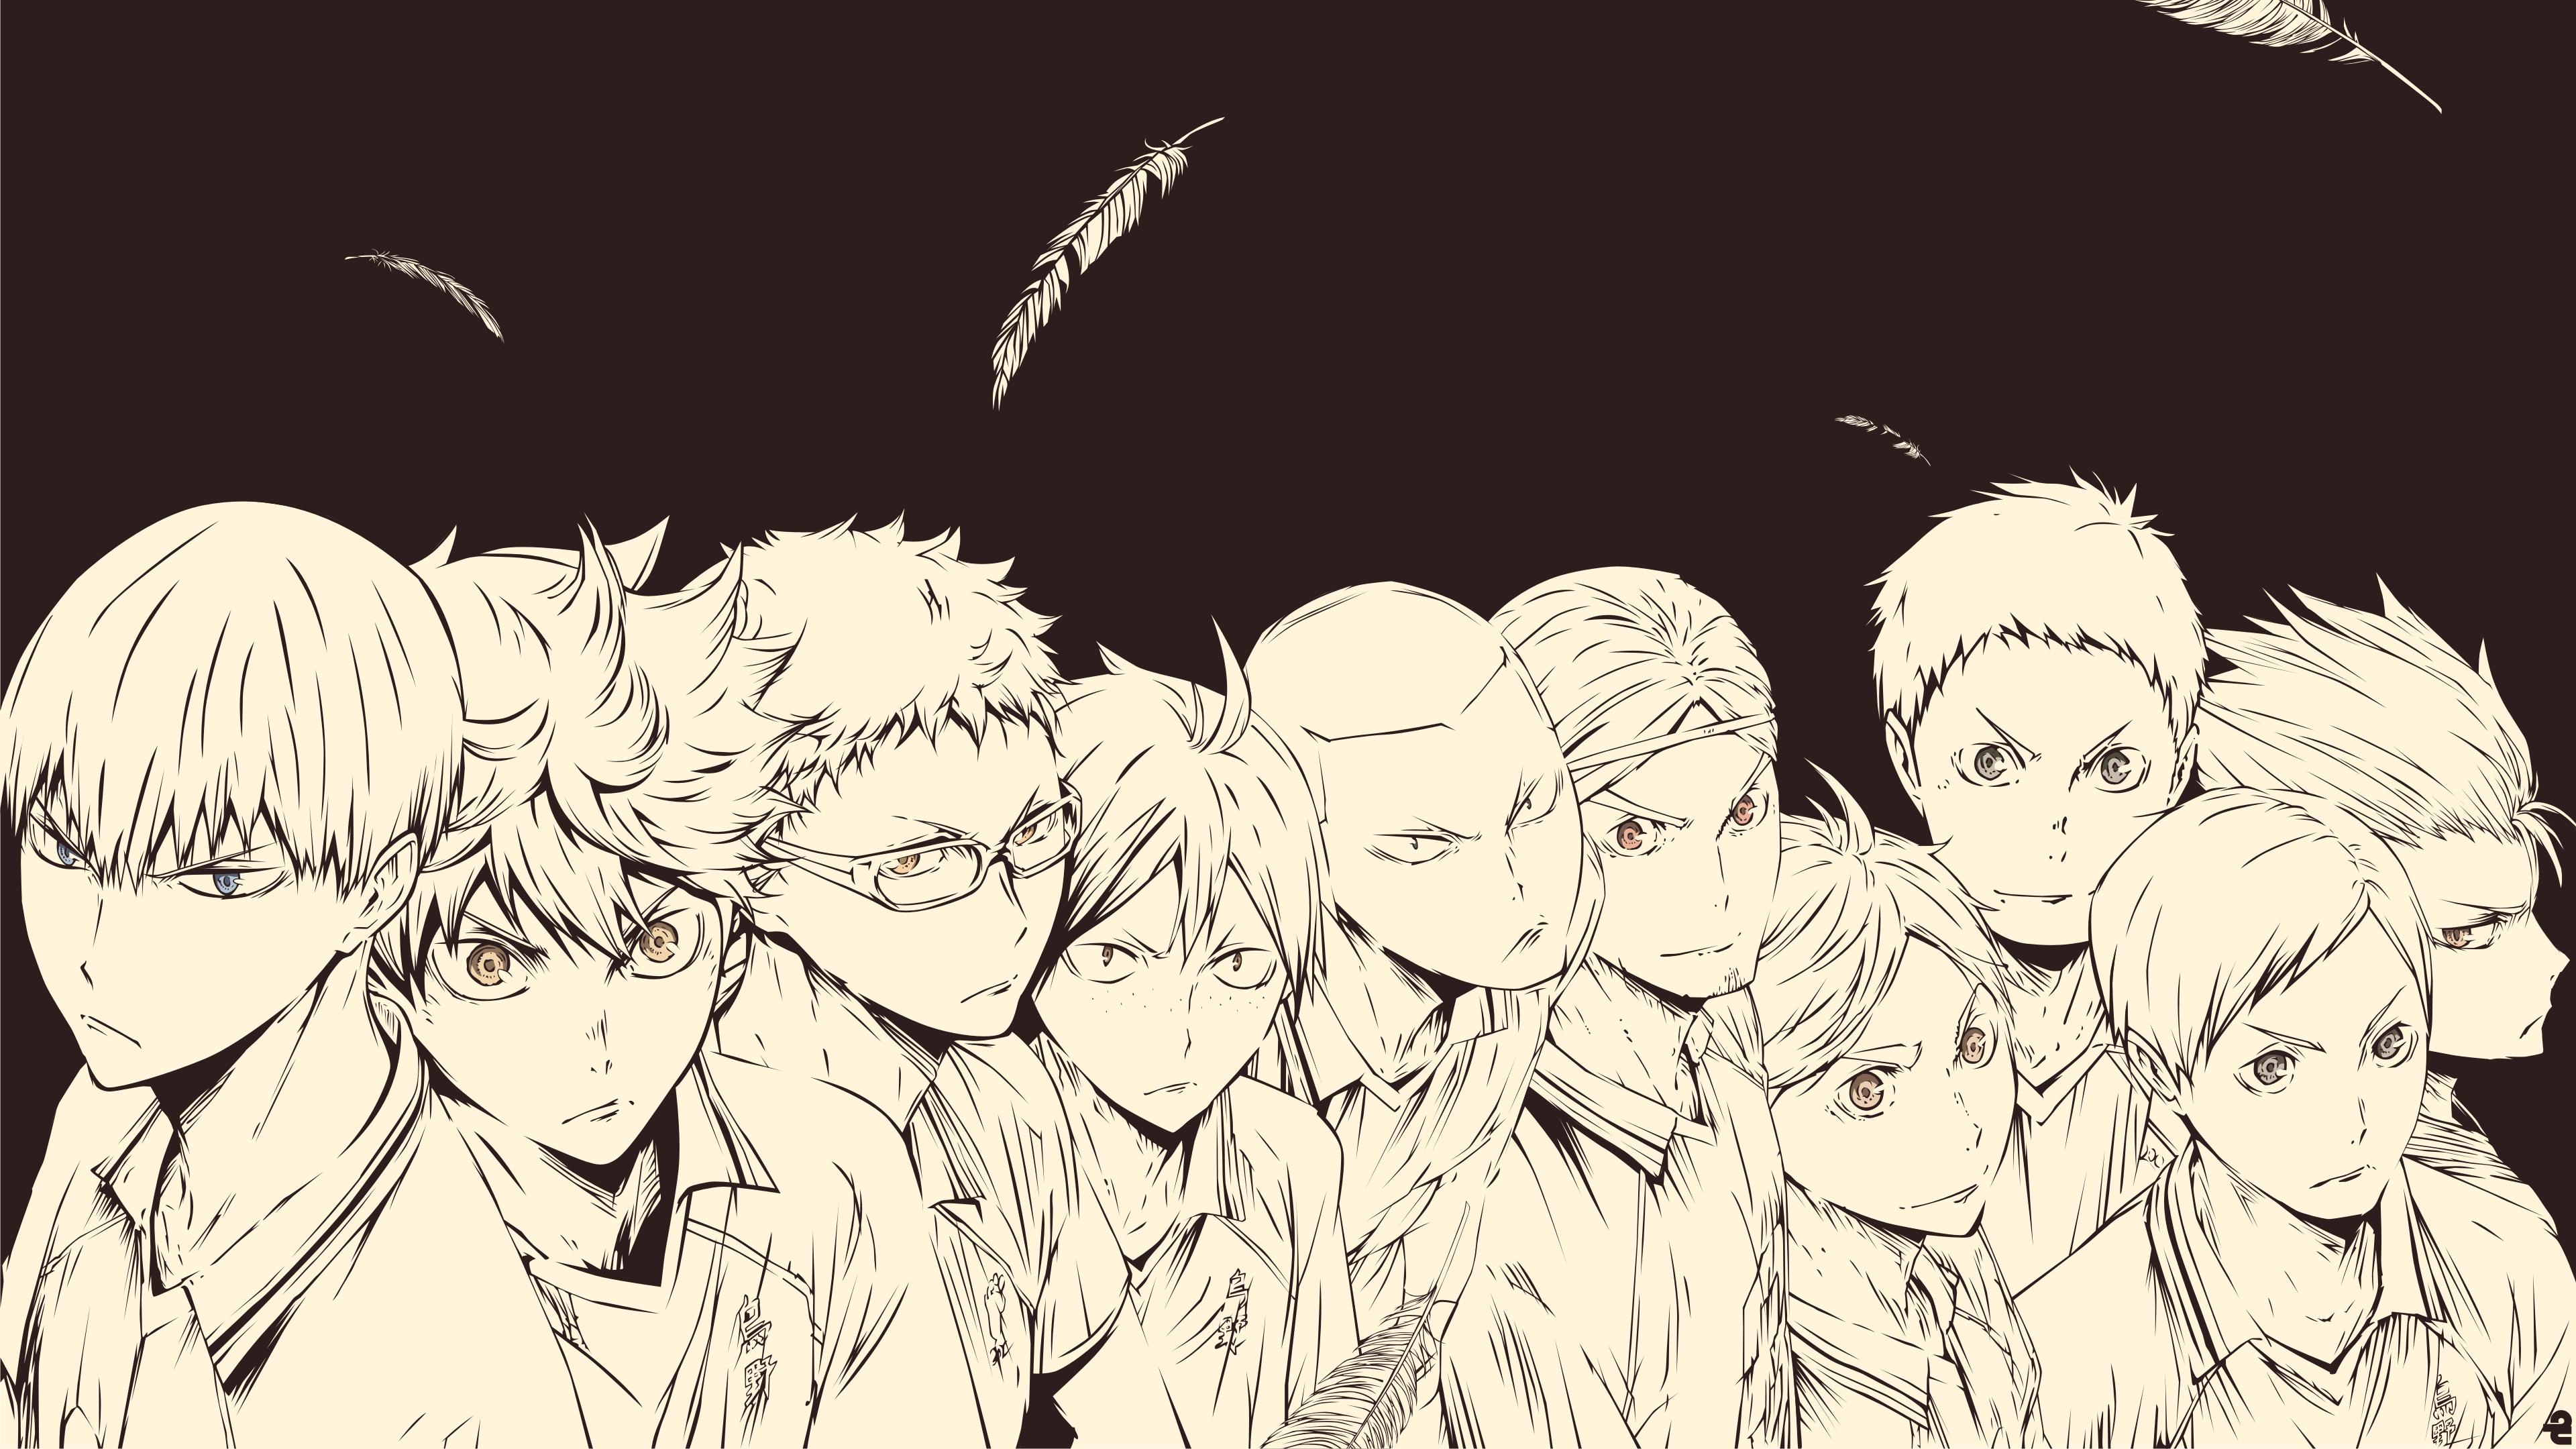 Hình nền 3840x2160 Haikyuu Karasuno - Hình nền Anime HD